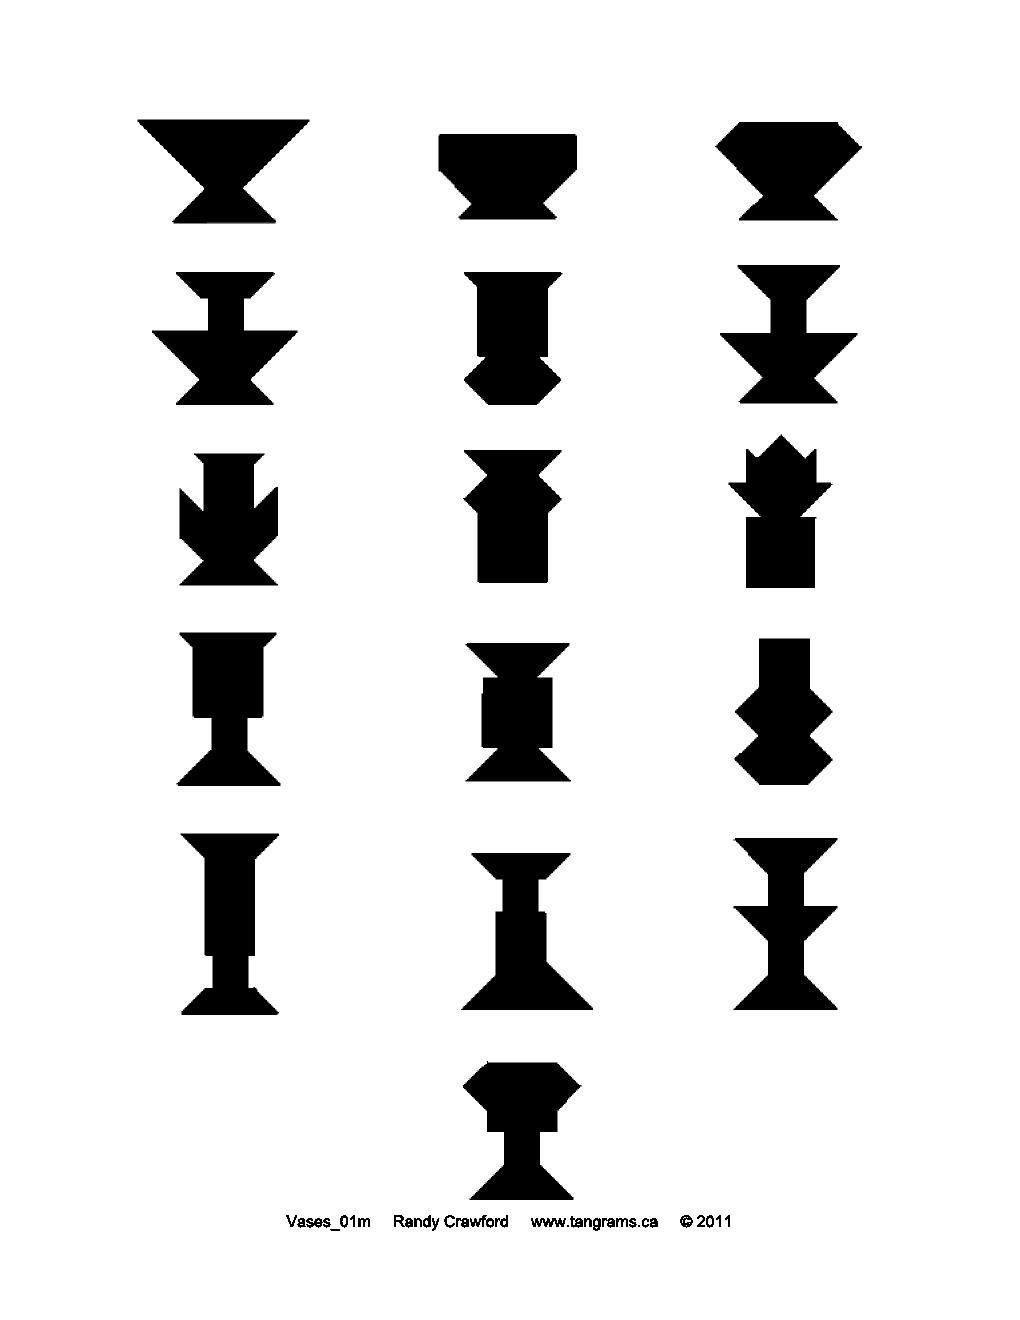 tangrams.ca/wp-content/gallery/vases/tangram-vases_01m.png